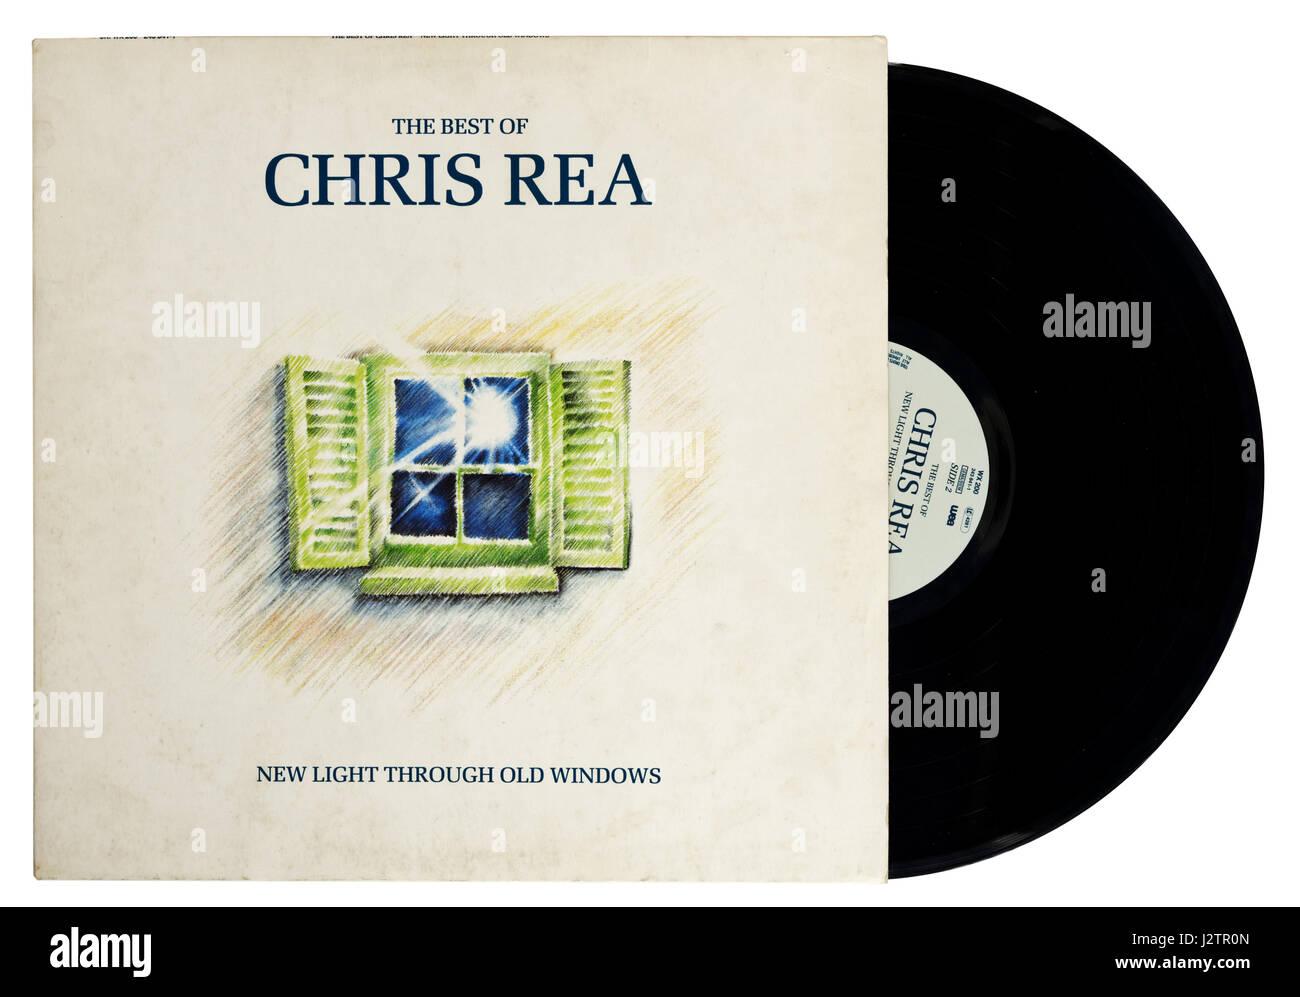 New Light Through Old Windows: The Best of Chris Rea vinyl record - Stock Image